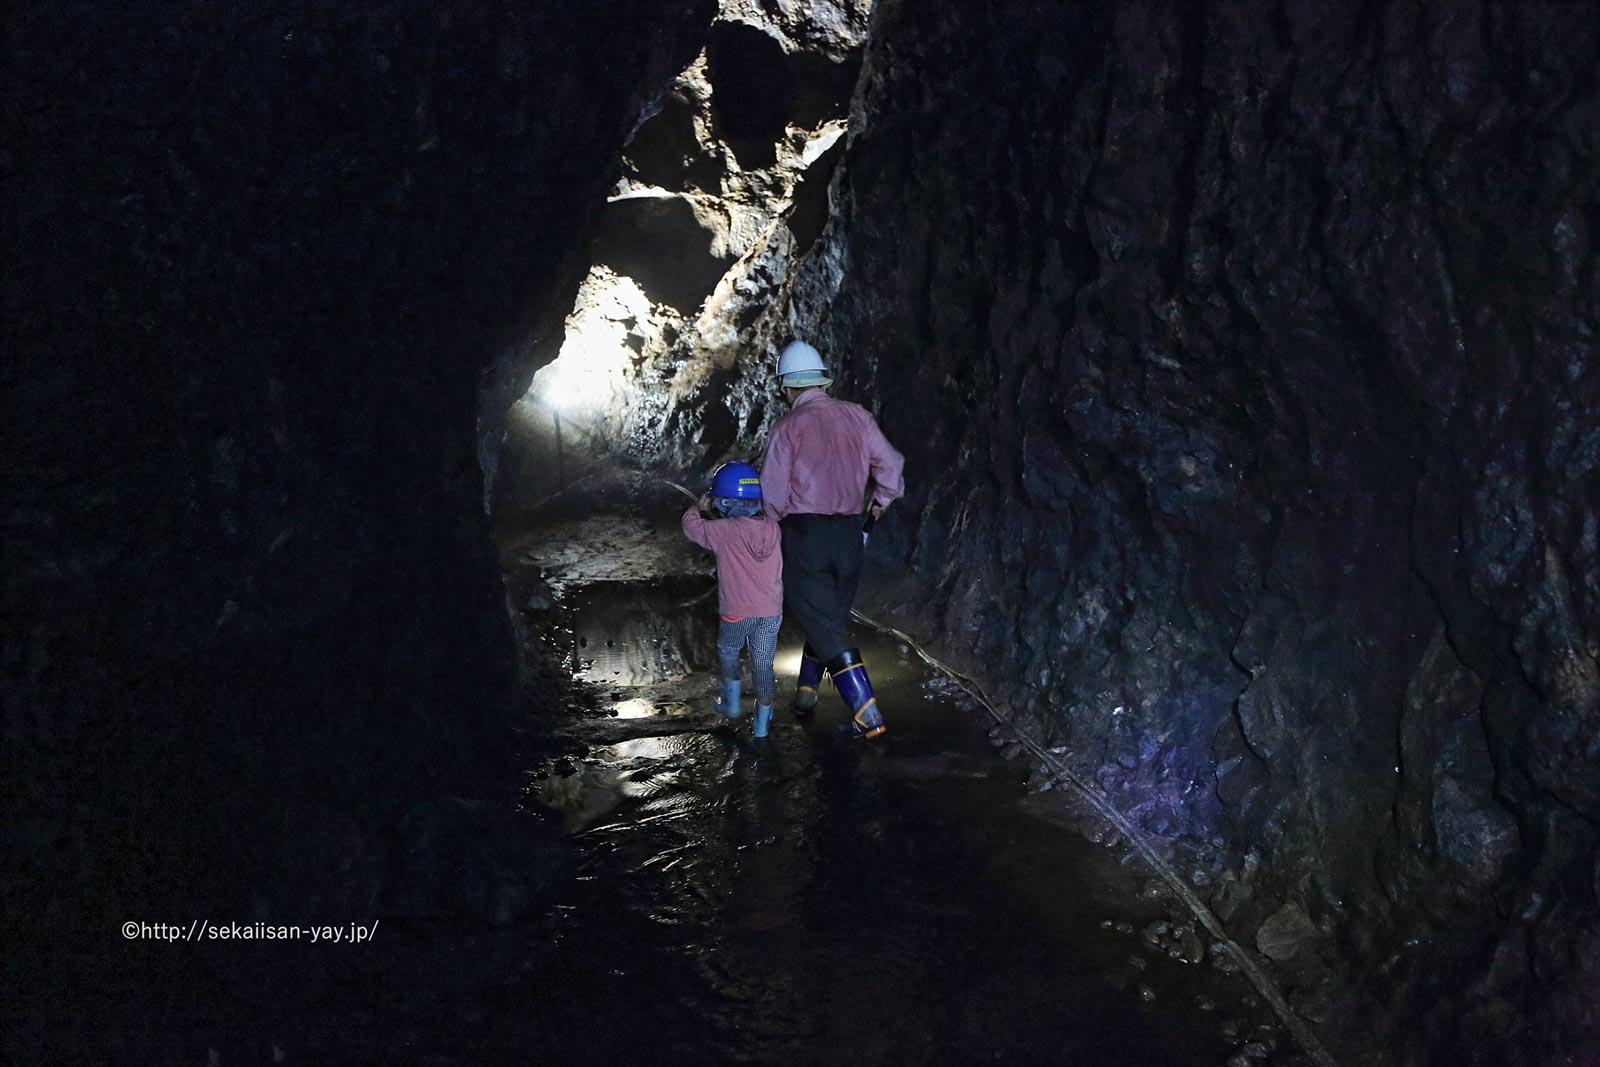 石見銀山遺跡とその文化的景観(大久保間歩)